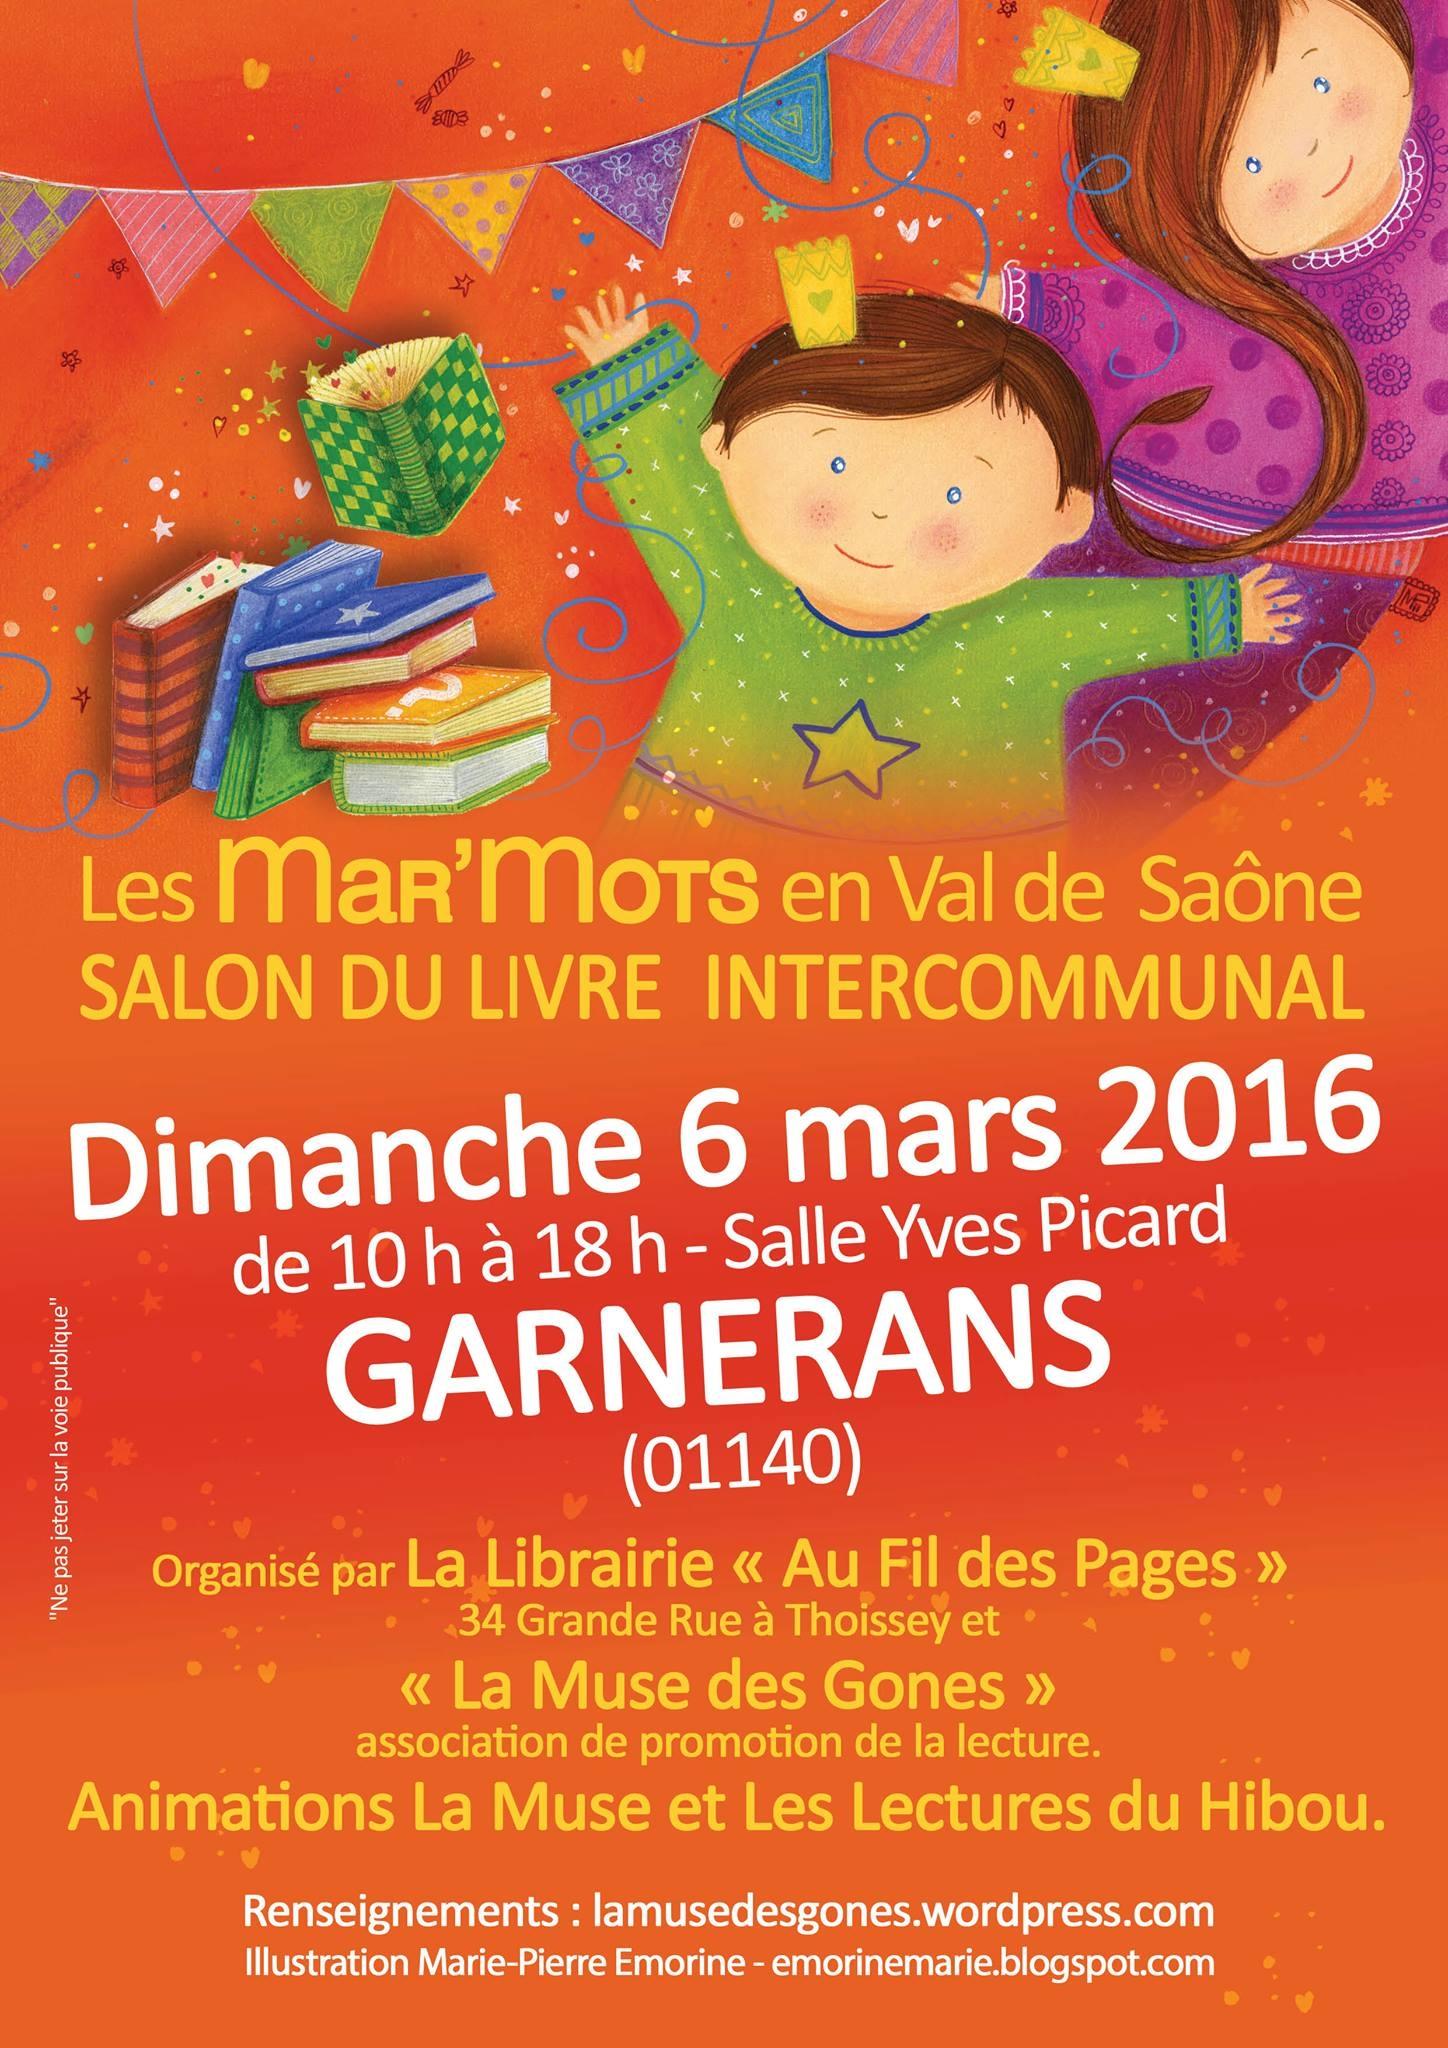 4eeb67a0dfe87cb46b385aca5f00f9e9 - Les Mar'Mots en Val de Saône